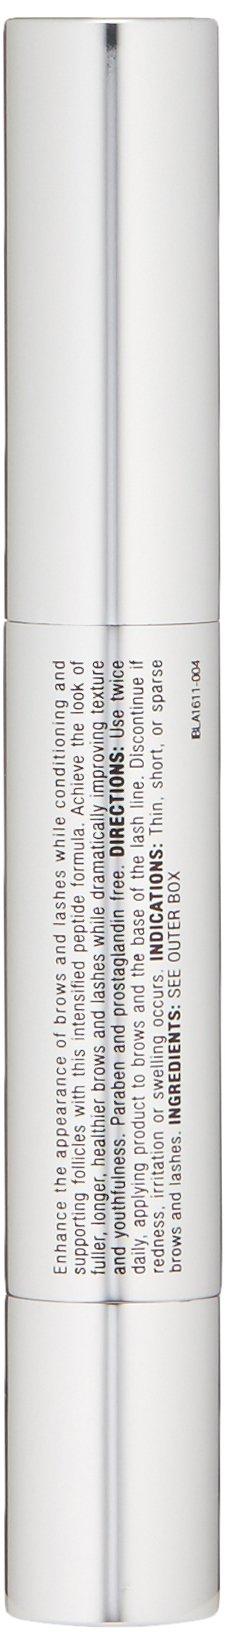 IMAGE Skincare I Beauty Brow and Lash Enhancement Serum, 0.14 oz. by IMAGE Skincare (Image #5)